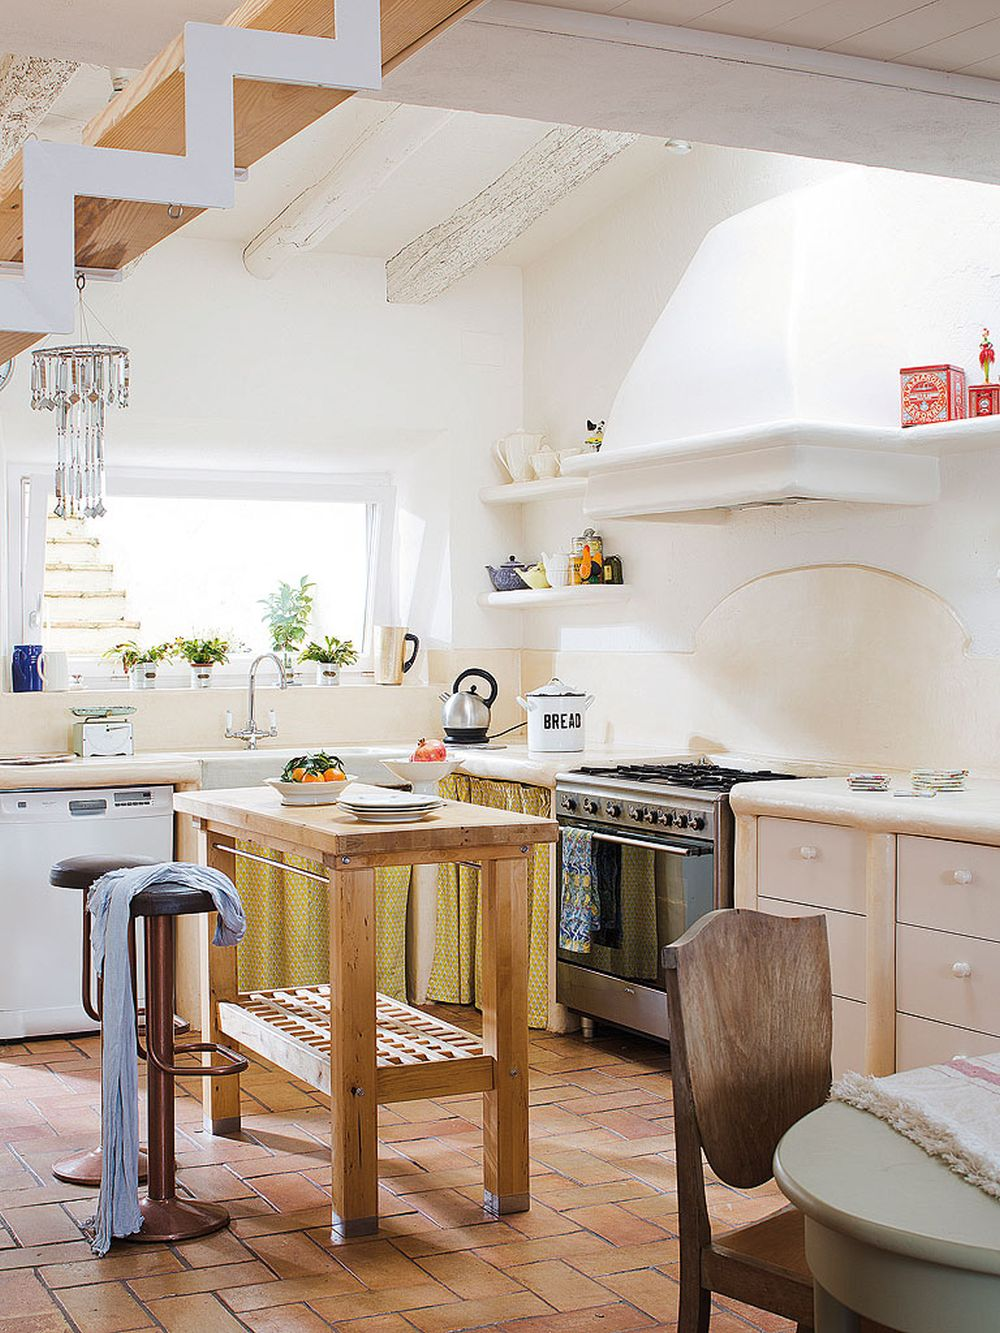 adelaparvu.com despre casa rustica cu pereti si plafoane albe, designer Josep Curanta, Foto MiCasa (6)